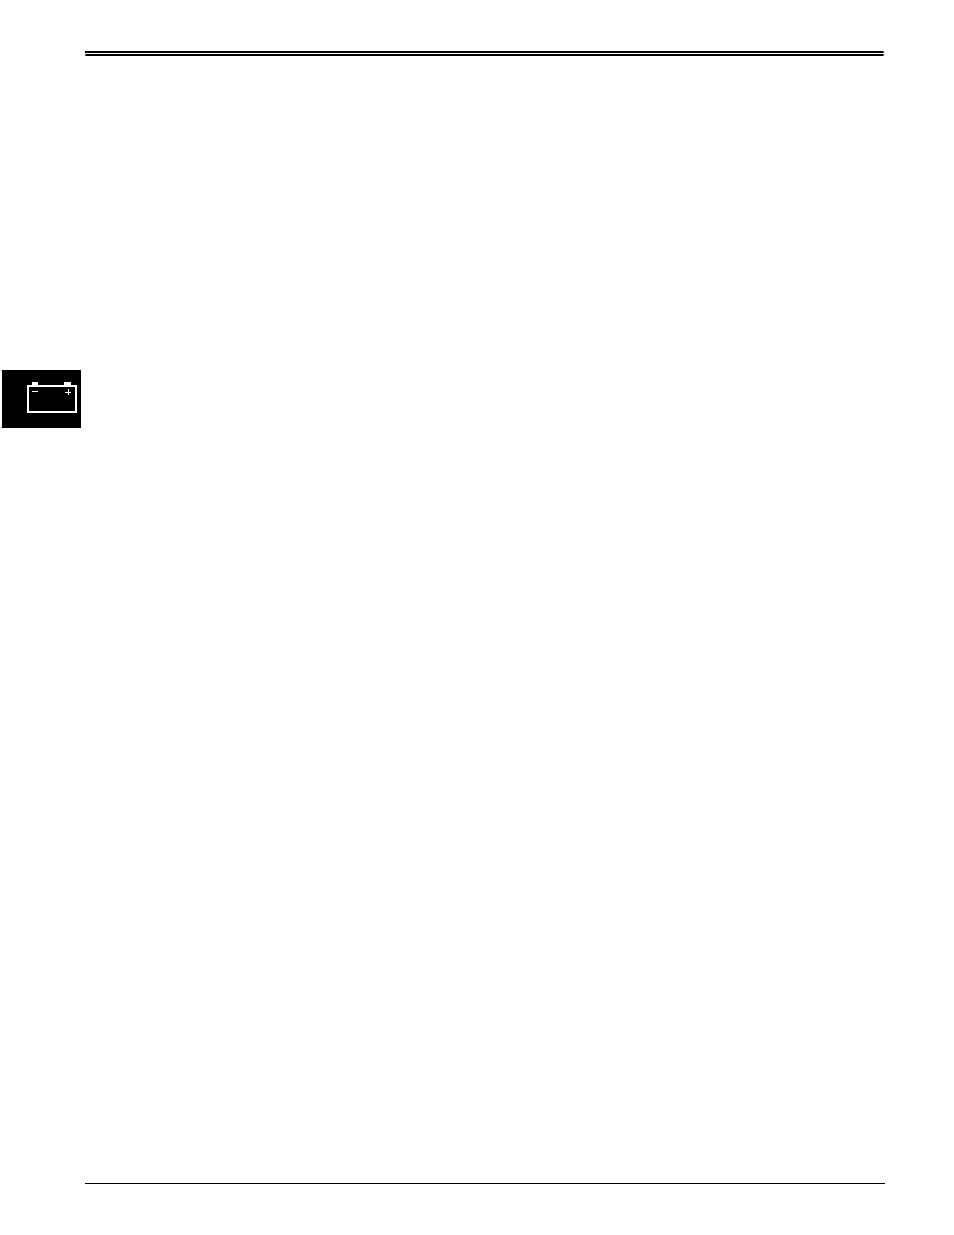 Collection John Deere 314 Wiring Schematic Pictures Wiring – John Deere 314 Wiring Schematic